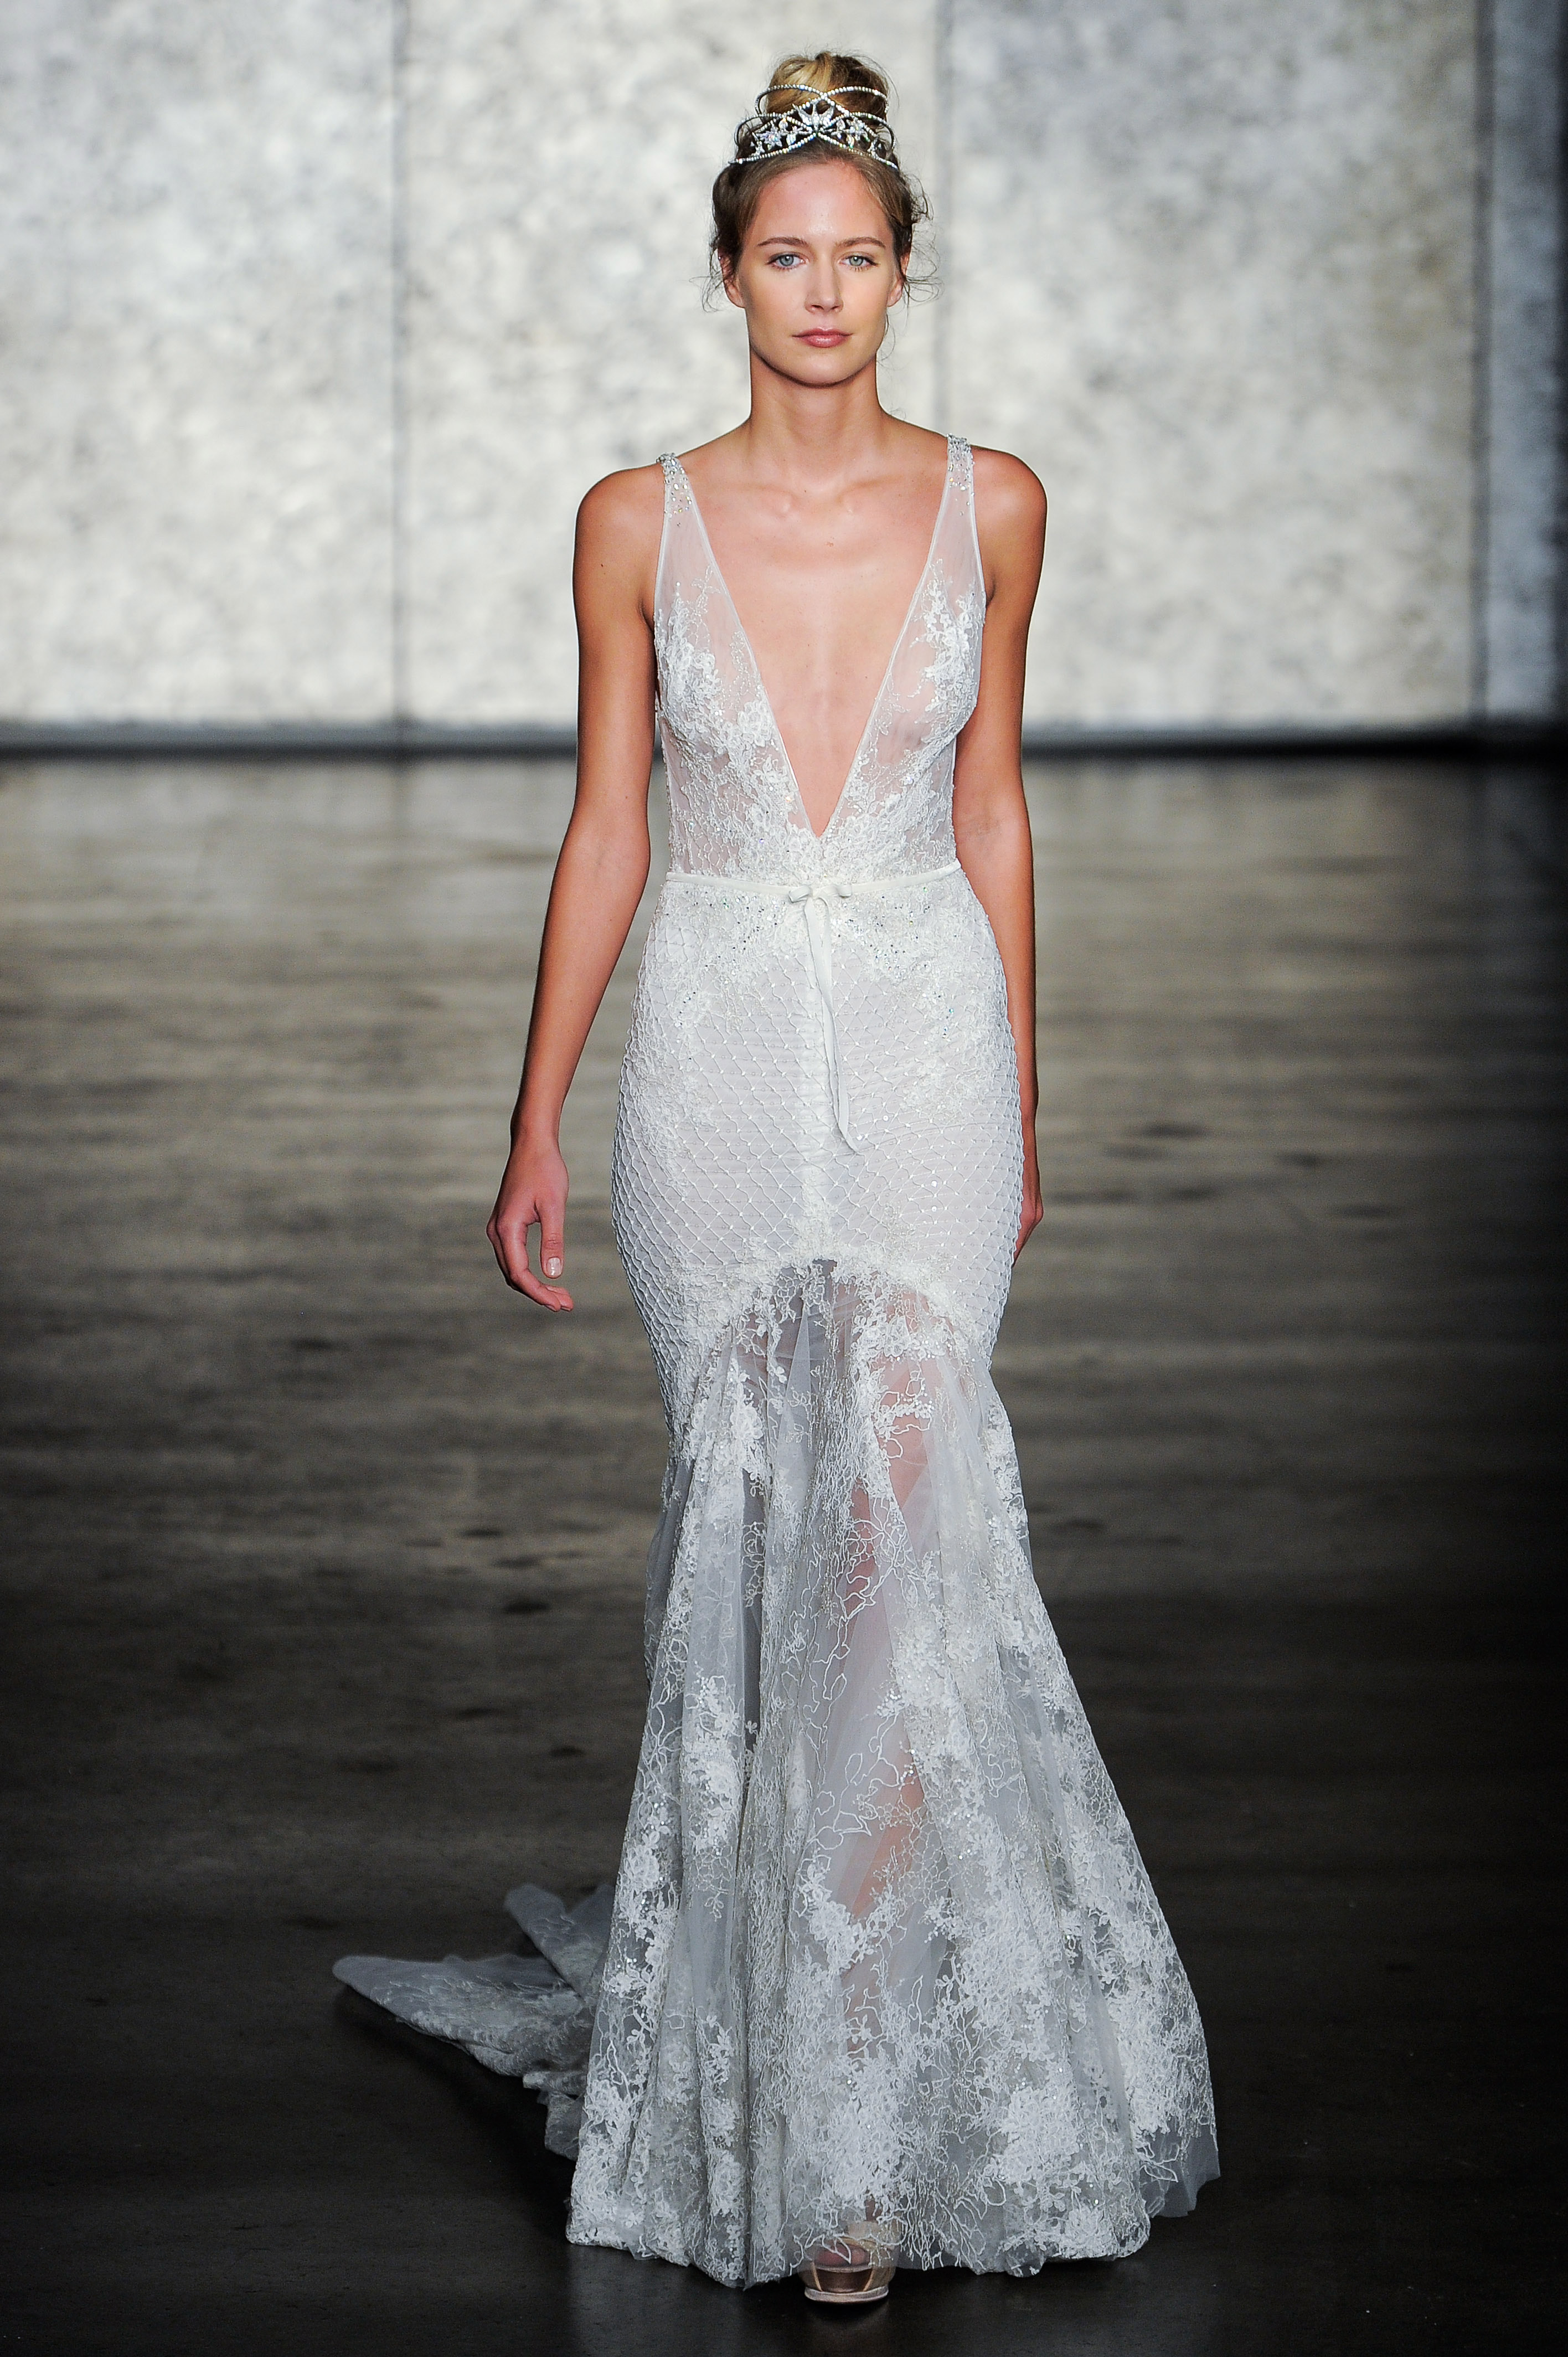 inbal dror fall 2018 plunging v-neck lace wedding dress